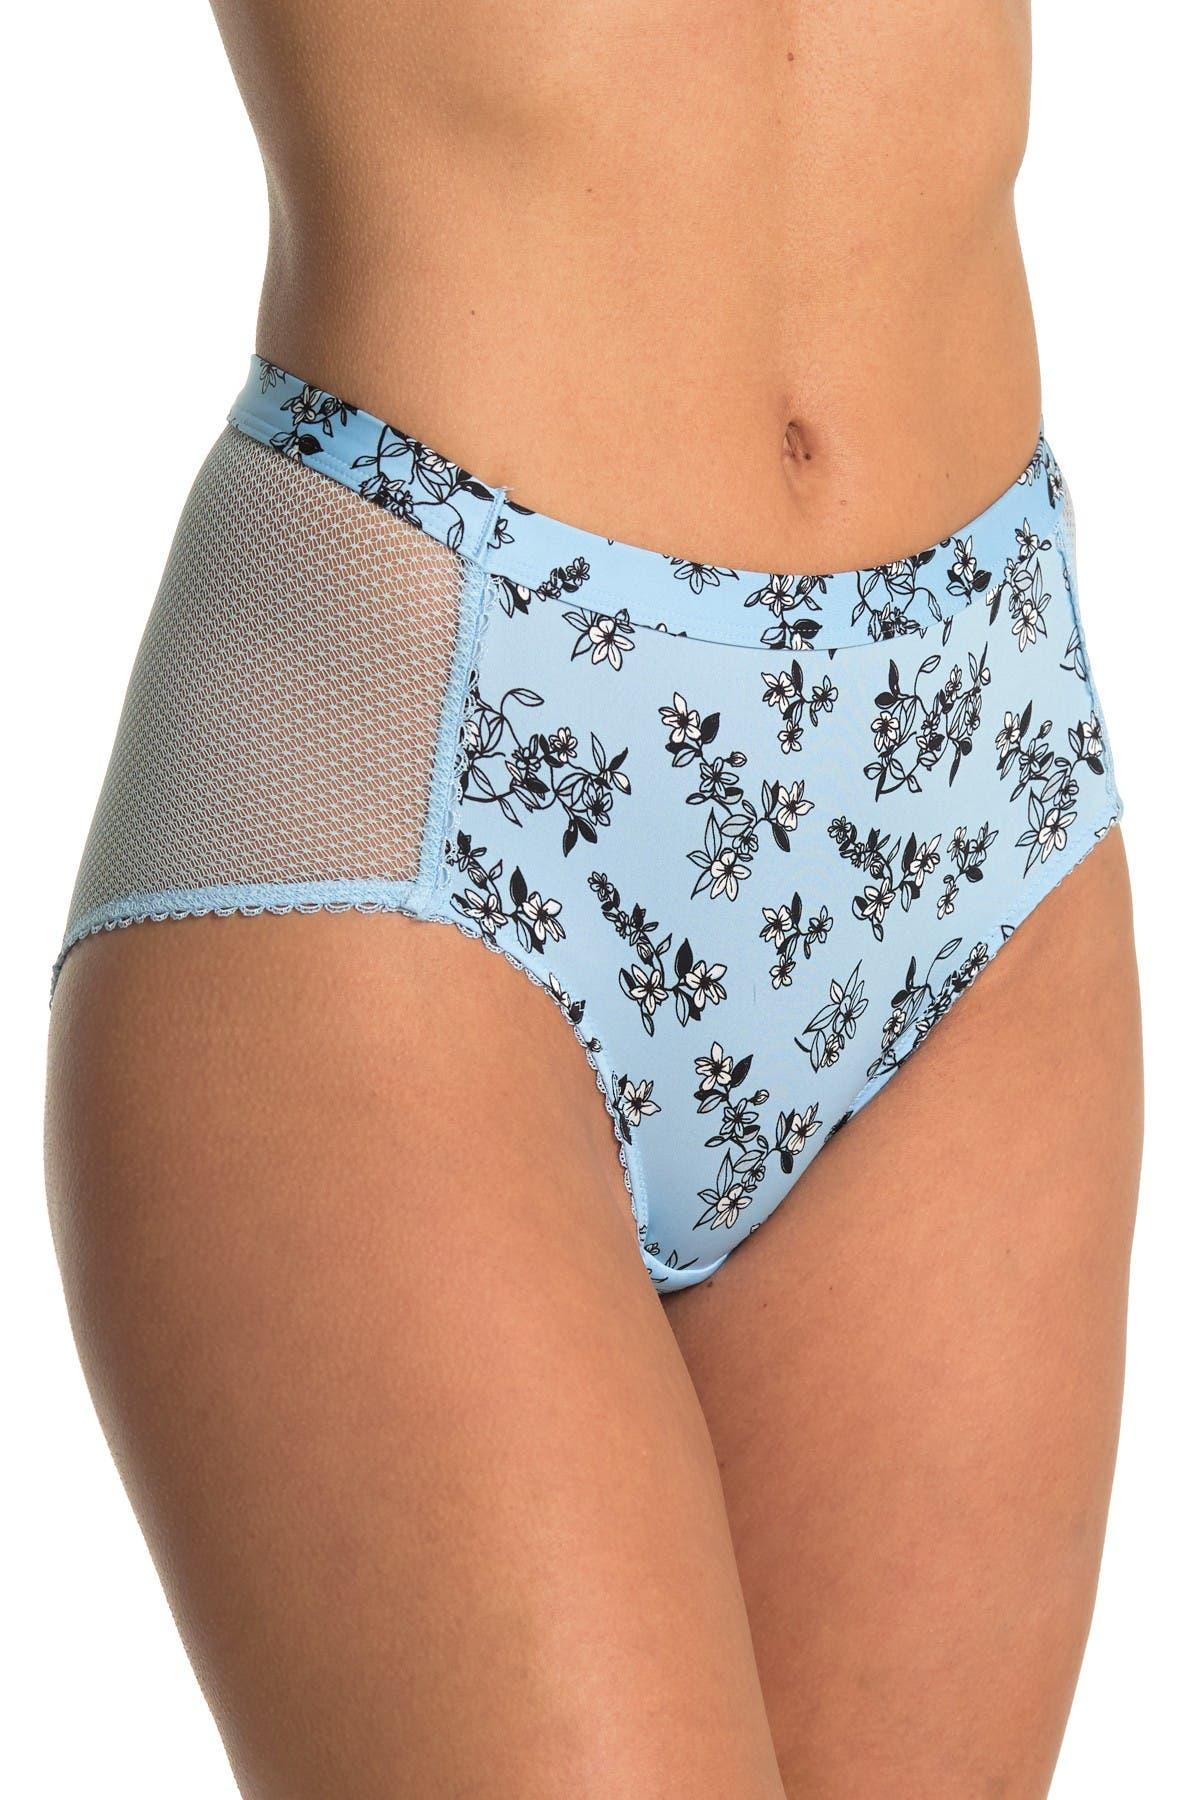 Image of Parfait High Waist Low Leg Panties